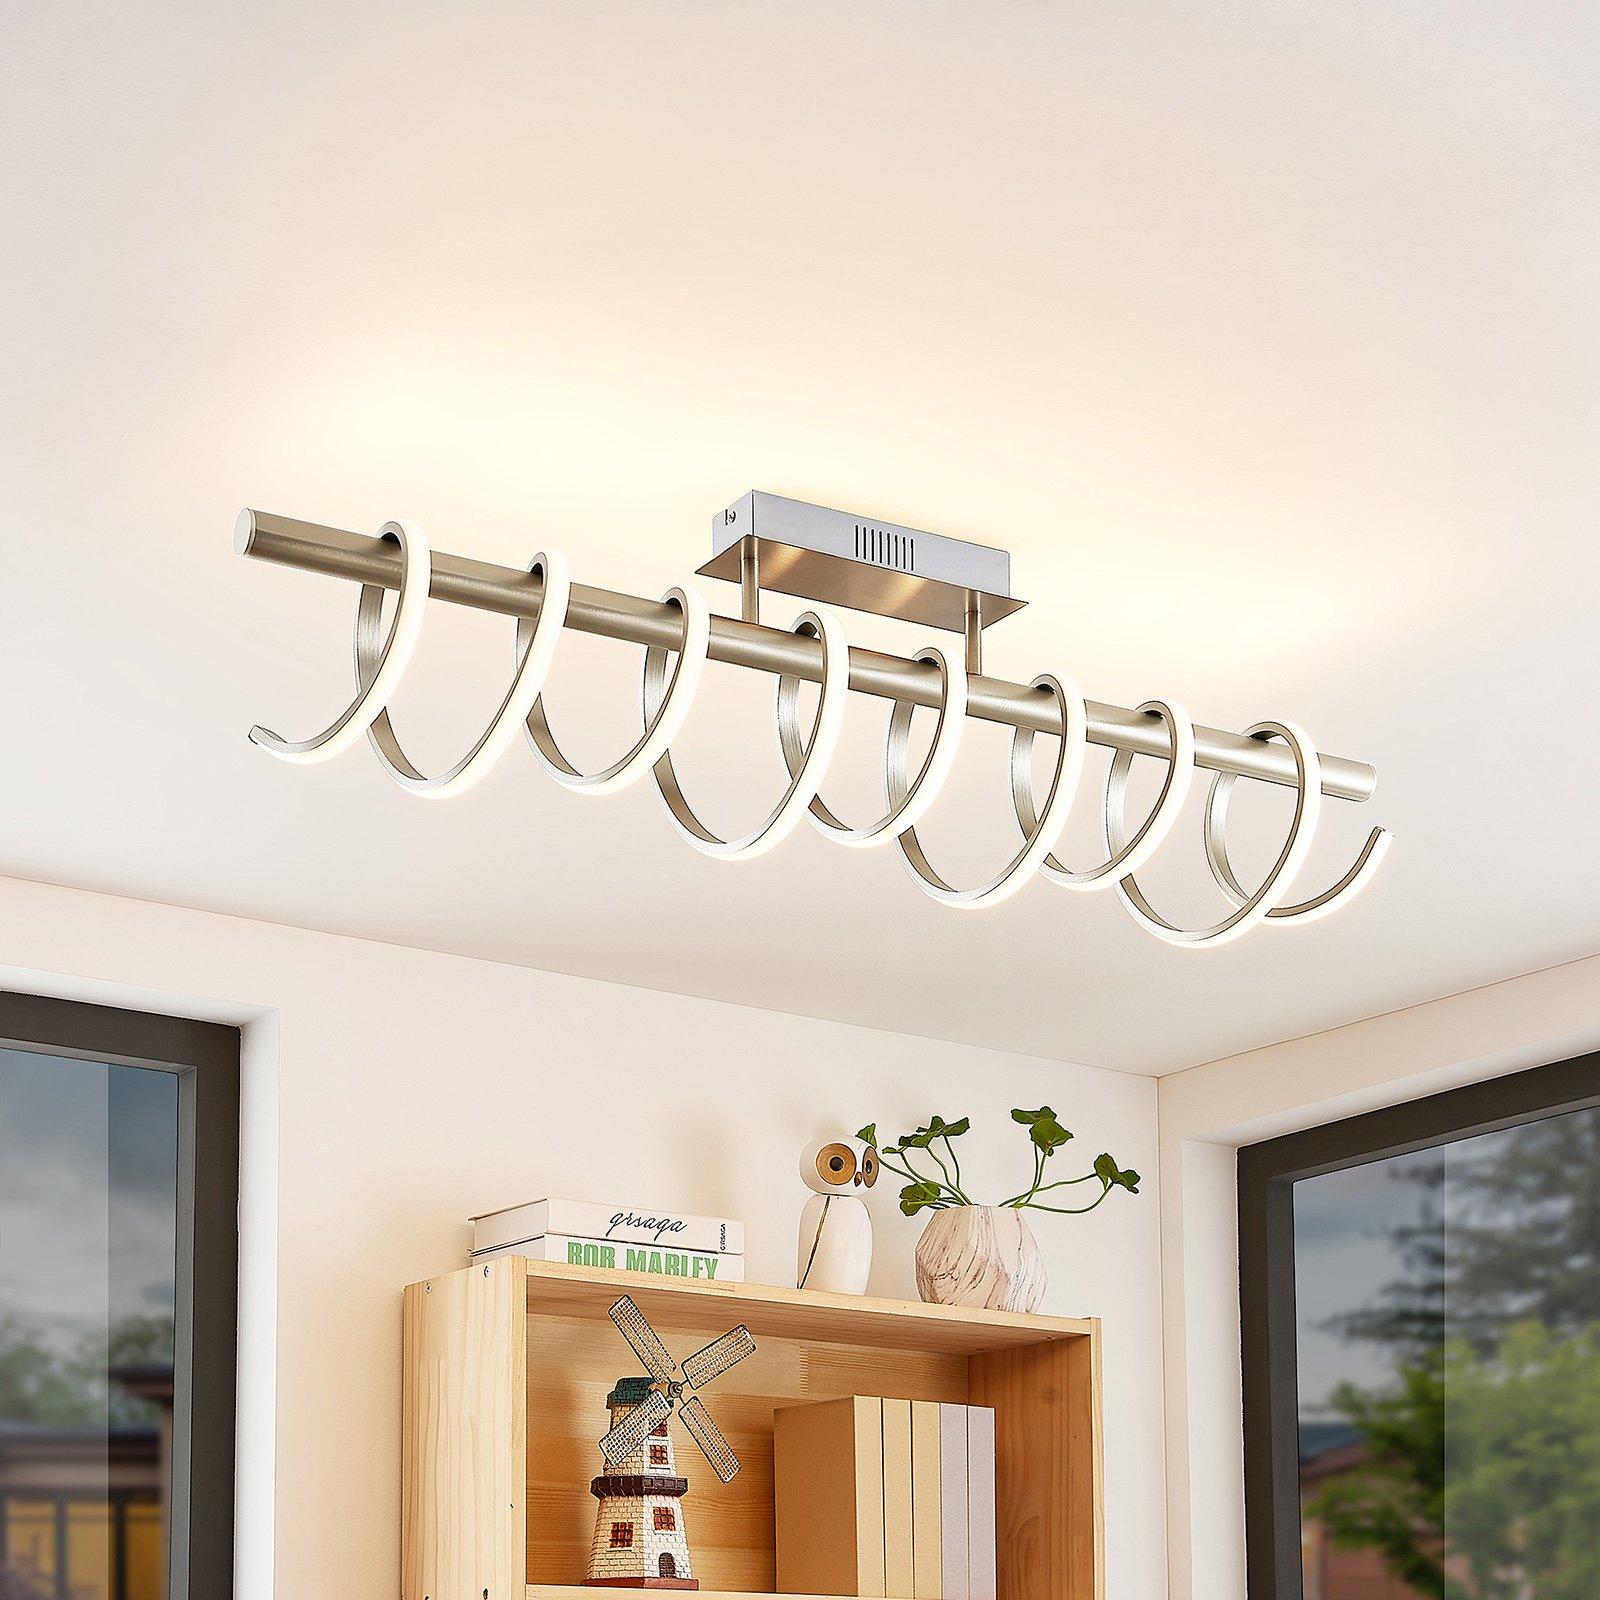 Lucande Milora LED-taklampe 100 cm, nikkel